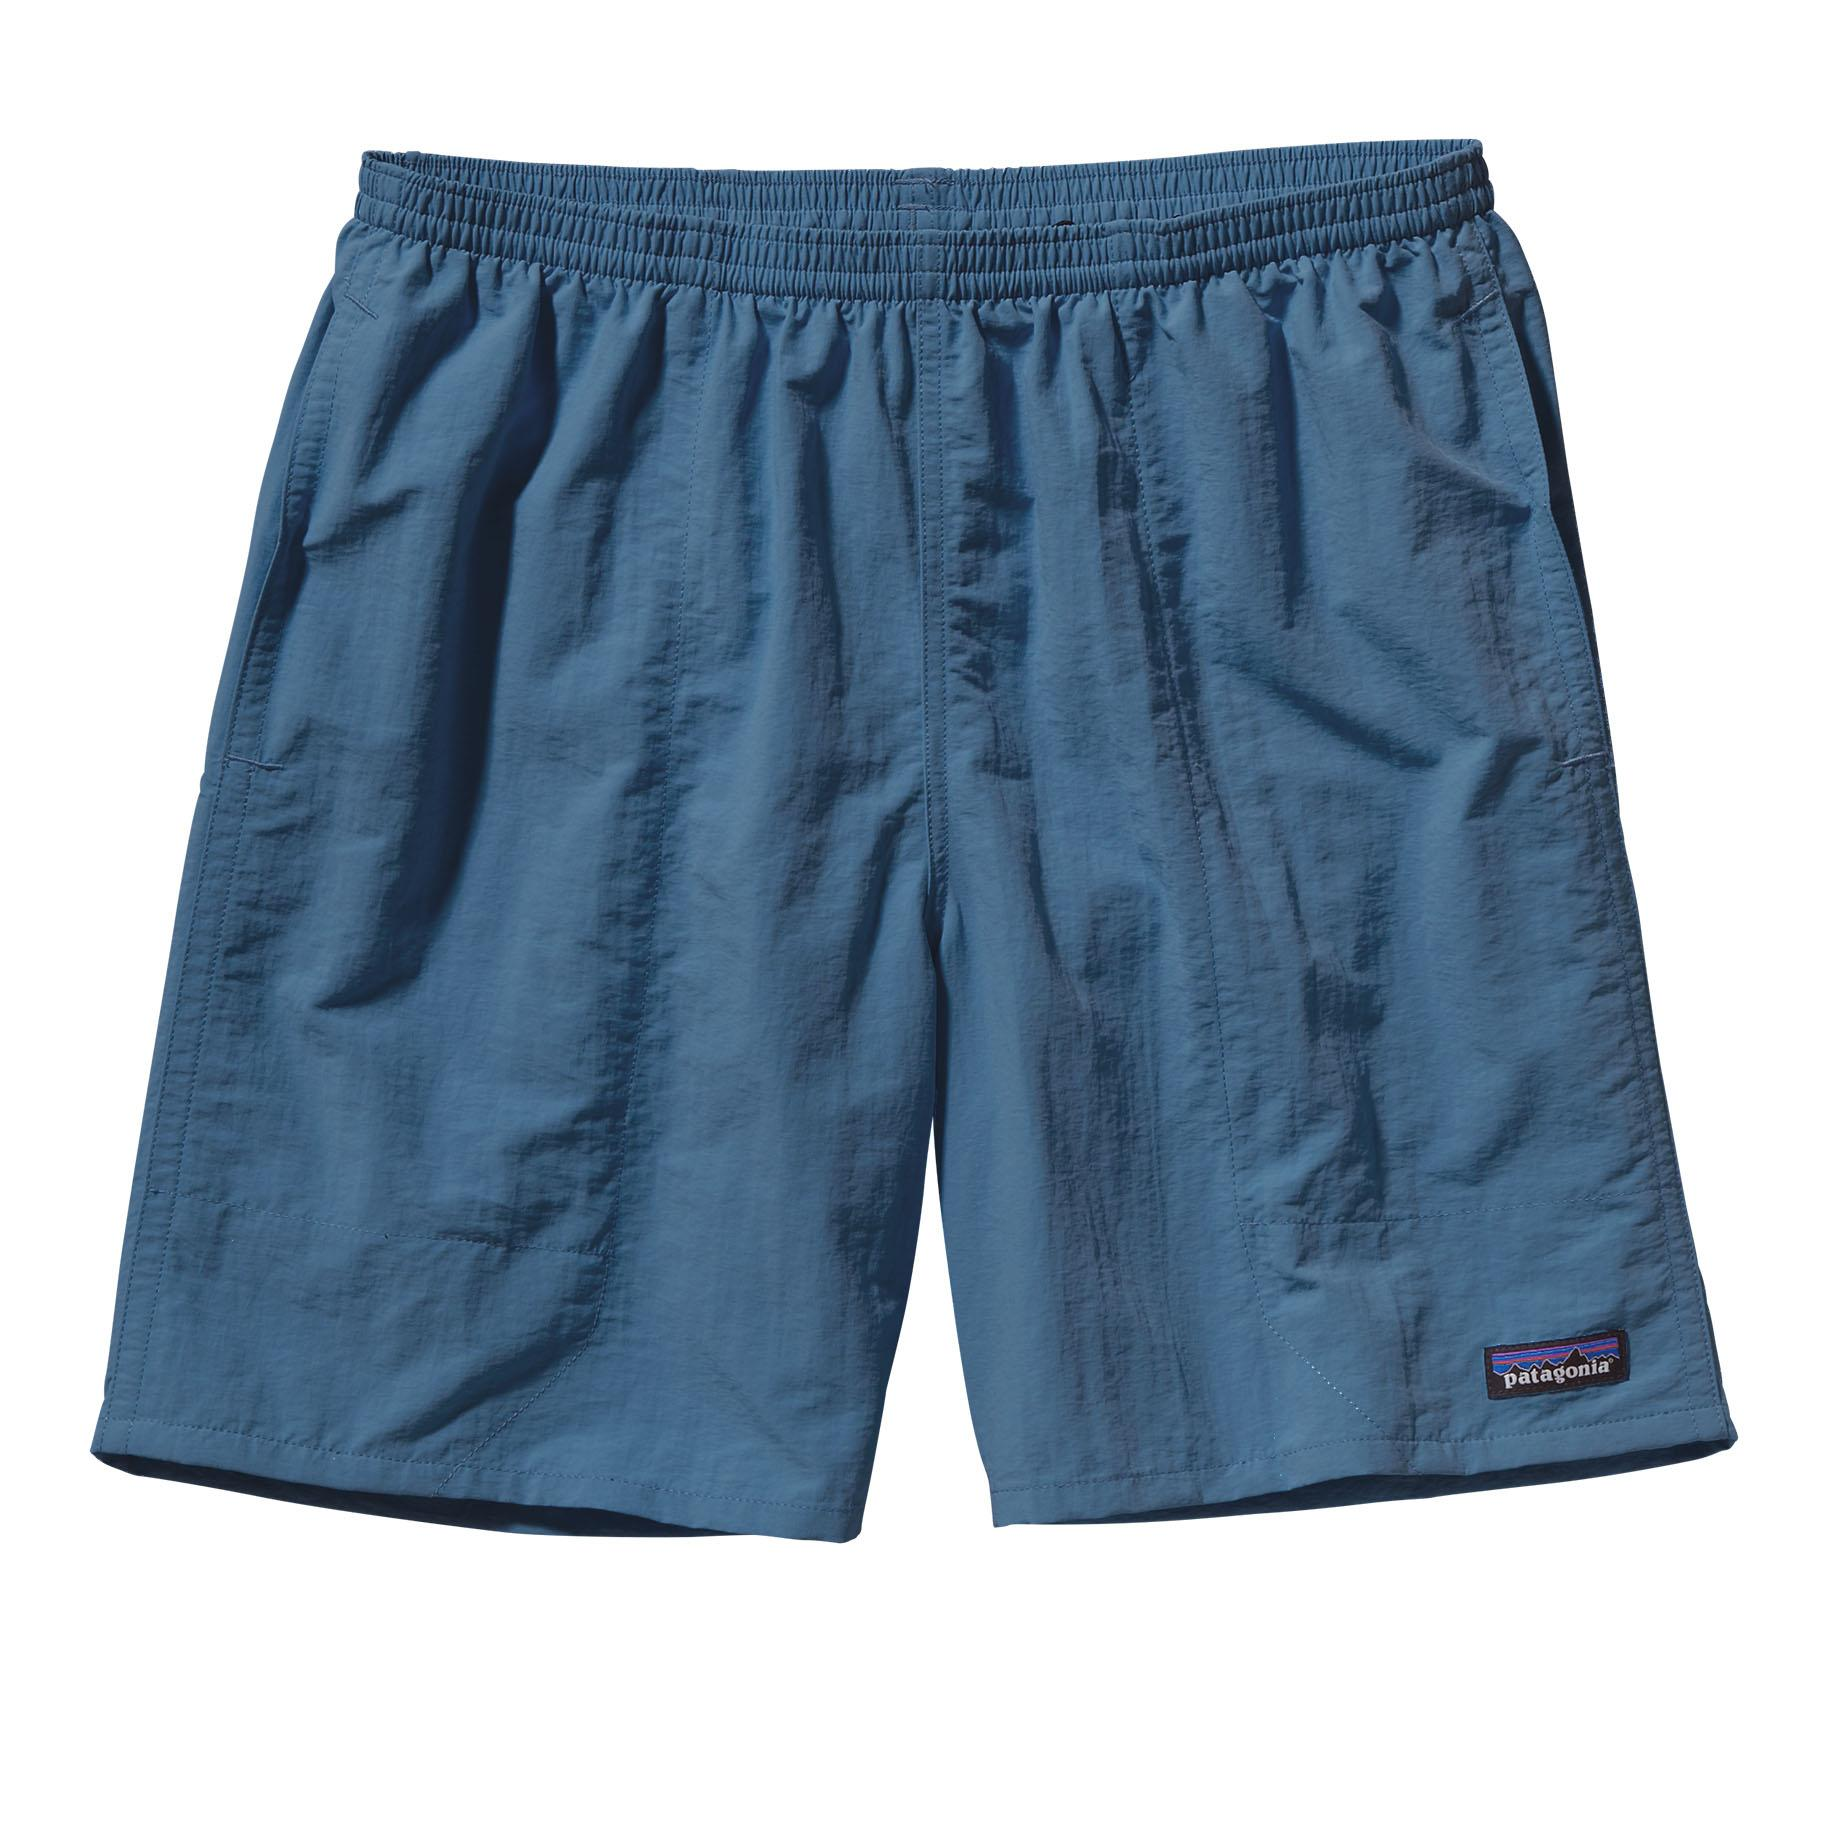 Patagonia Men's Baggies Shorts 7in Inseam GLSB_GLBLUE